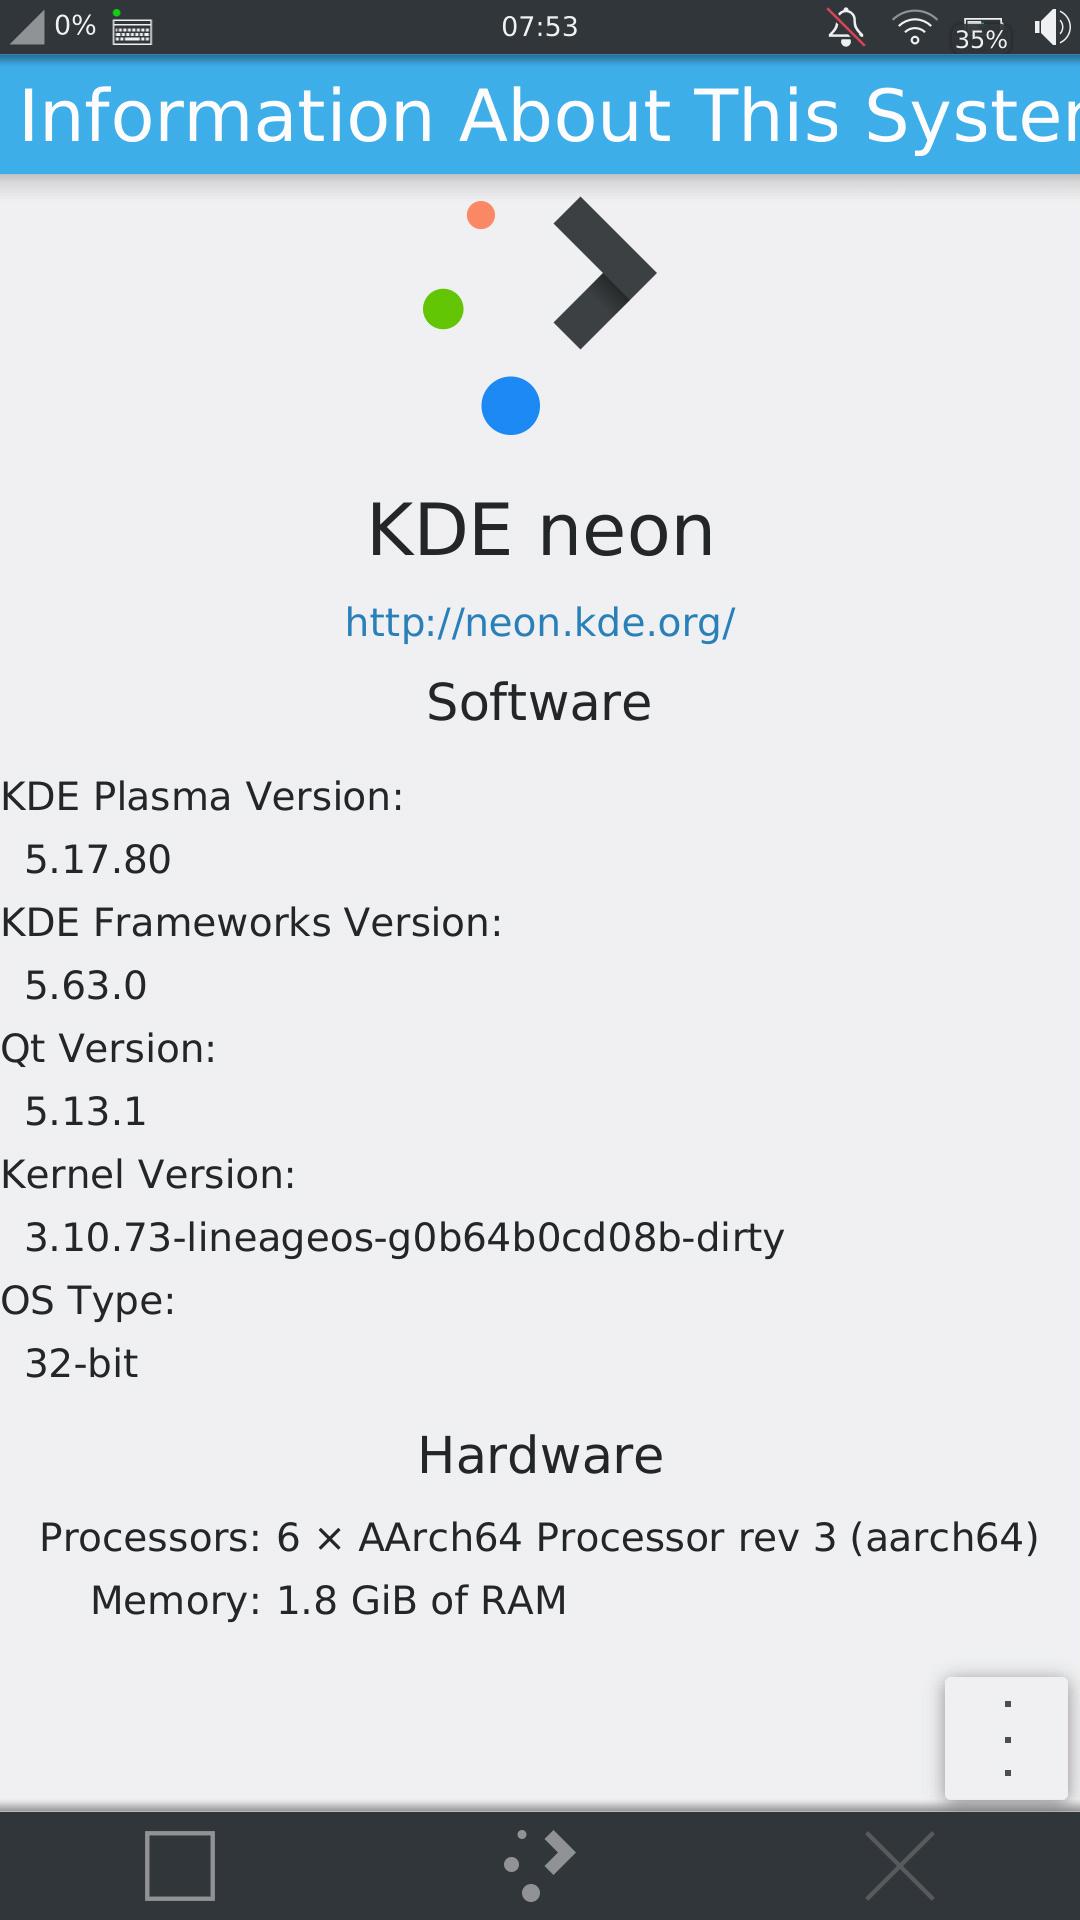 img/screenshots/about-info-kcm.png